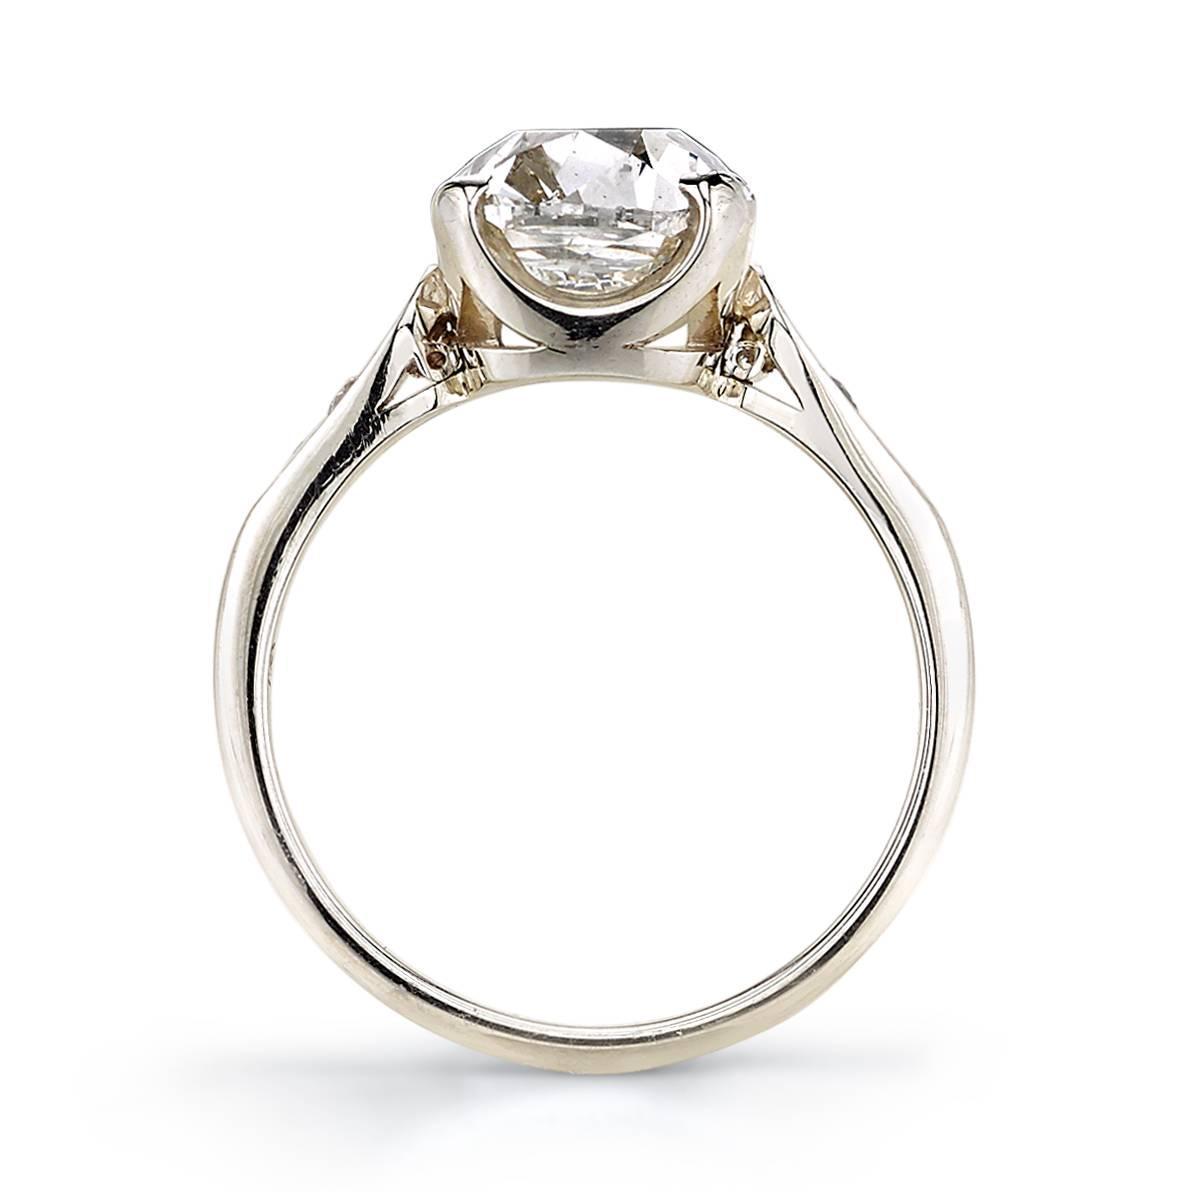 3 72 Carat Cushion Cut Diamond Gold Ring at 1stdibs